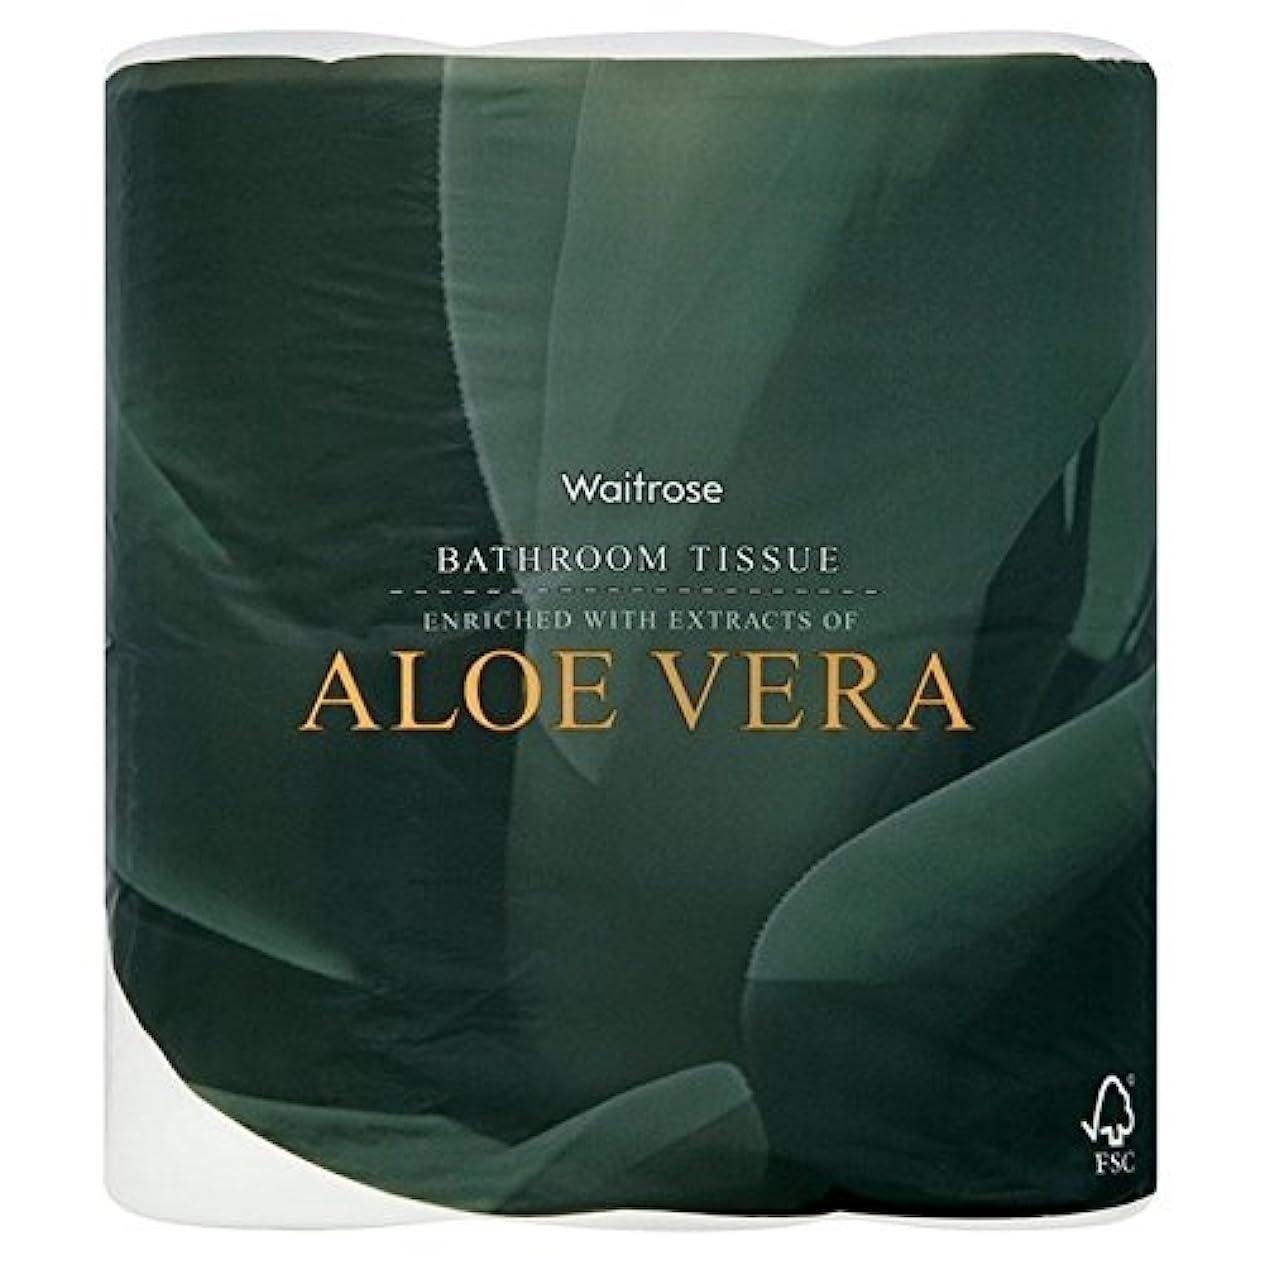 Aloe Vera Bathroom Tissue White Waitrose 4 per pack (Pack of 6) - パックあたりアロエベラ浴室組織白ウェイトローズ4 x6 [並行輸入品]